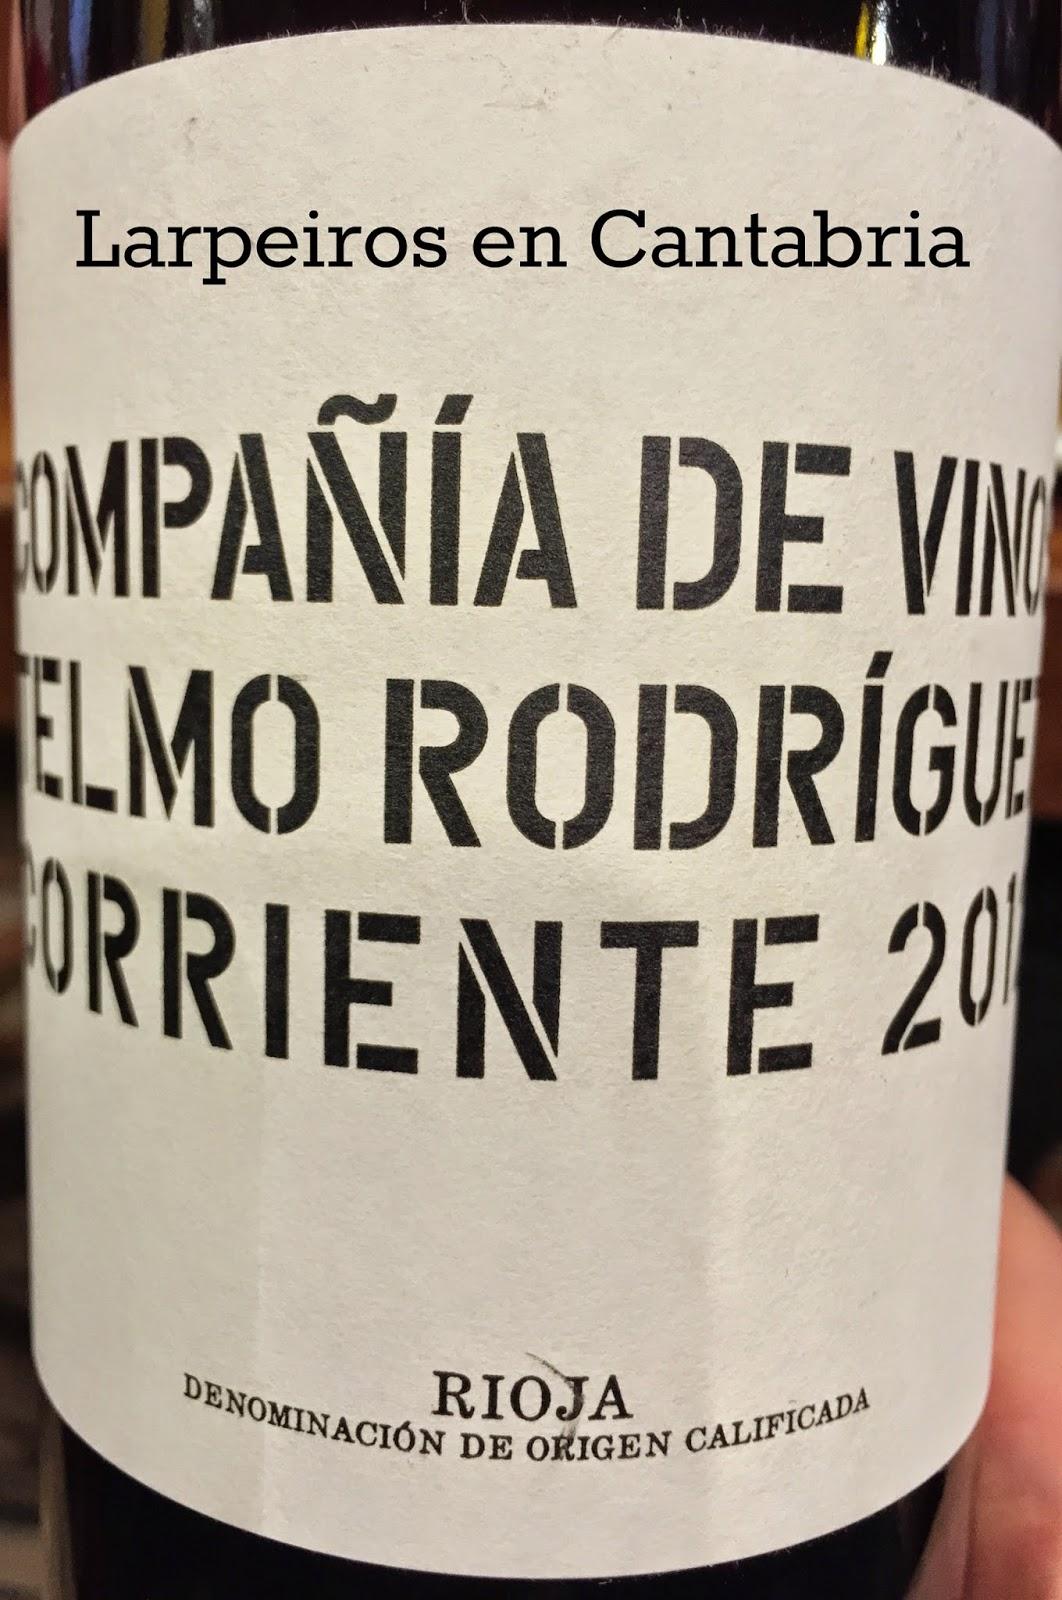 Vino Tinto Corriente 2012: Rioja de Telmo Rodríguez